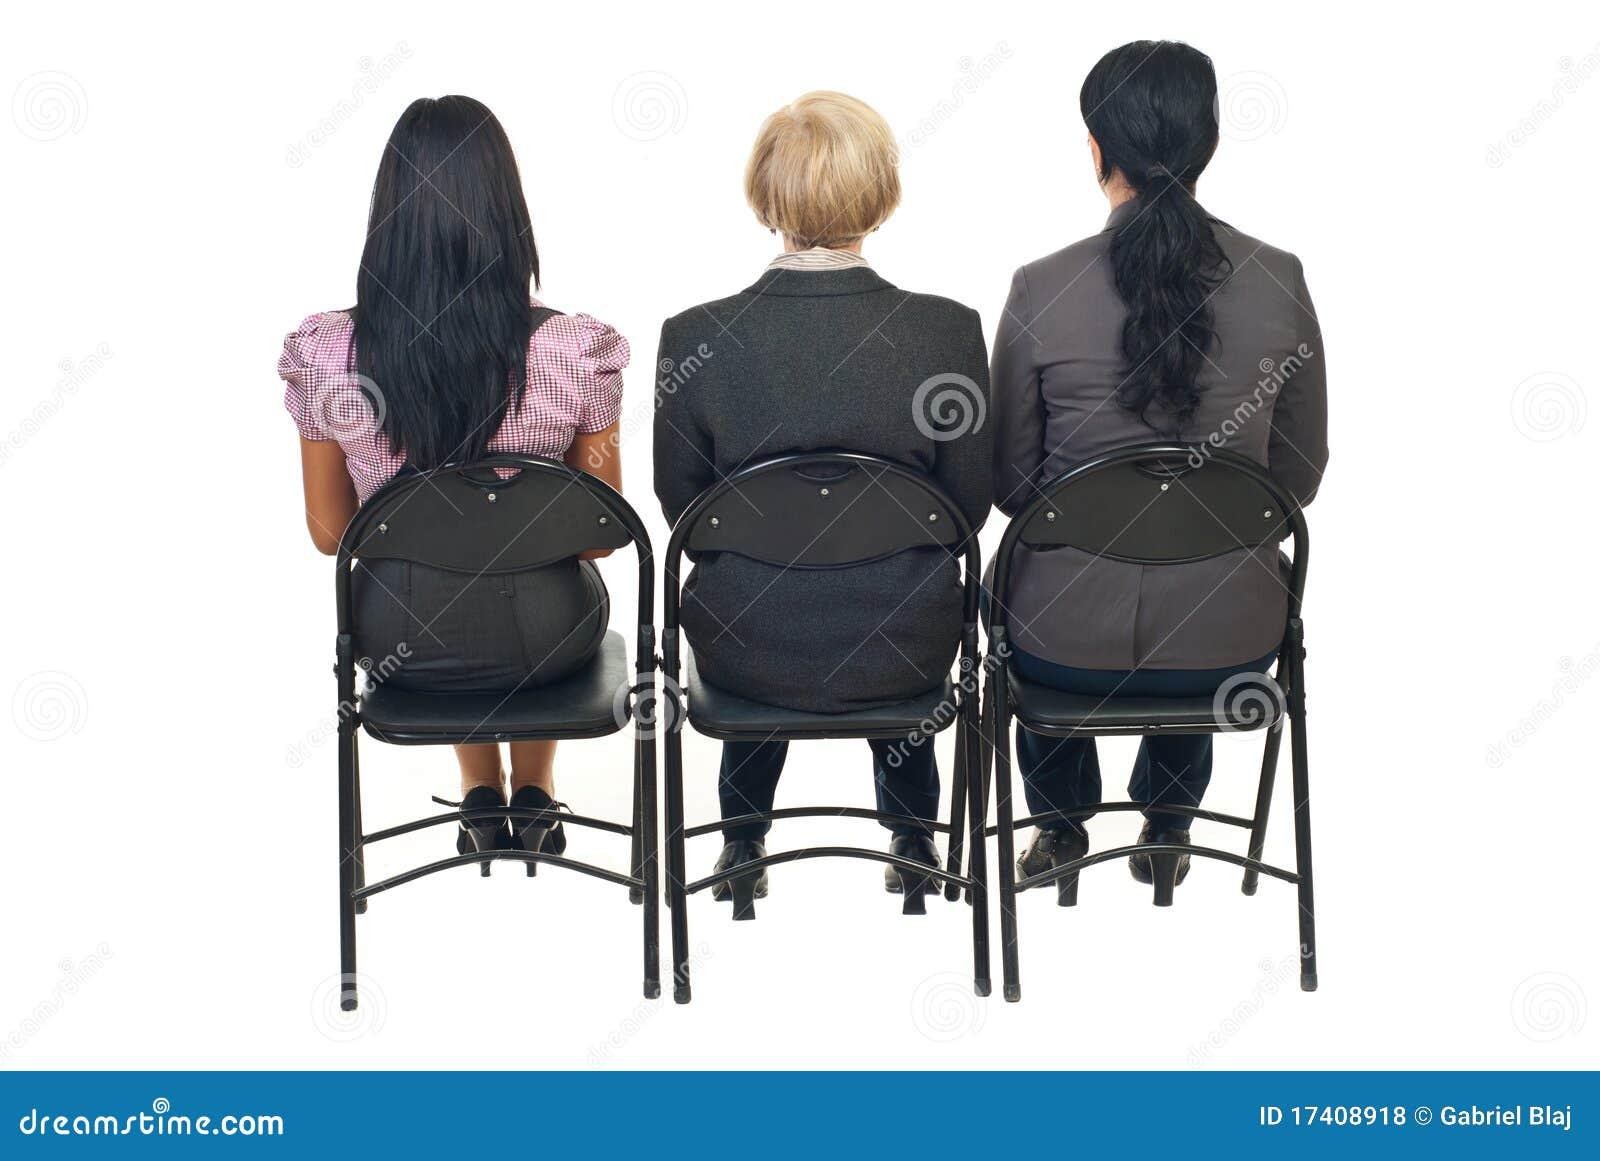 Back of three women at presentation